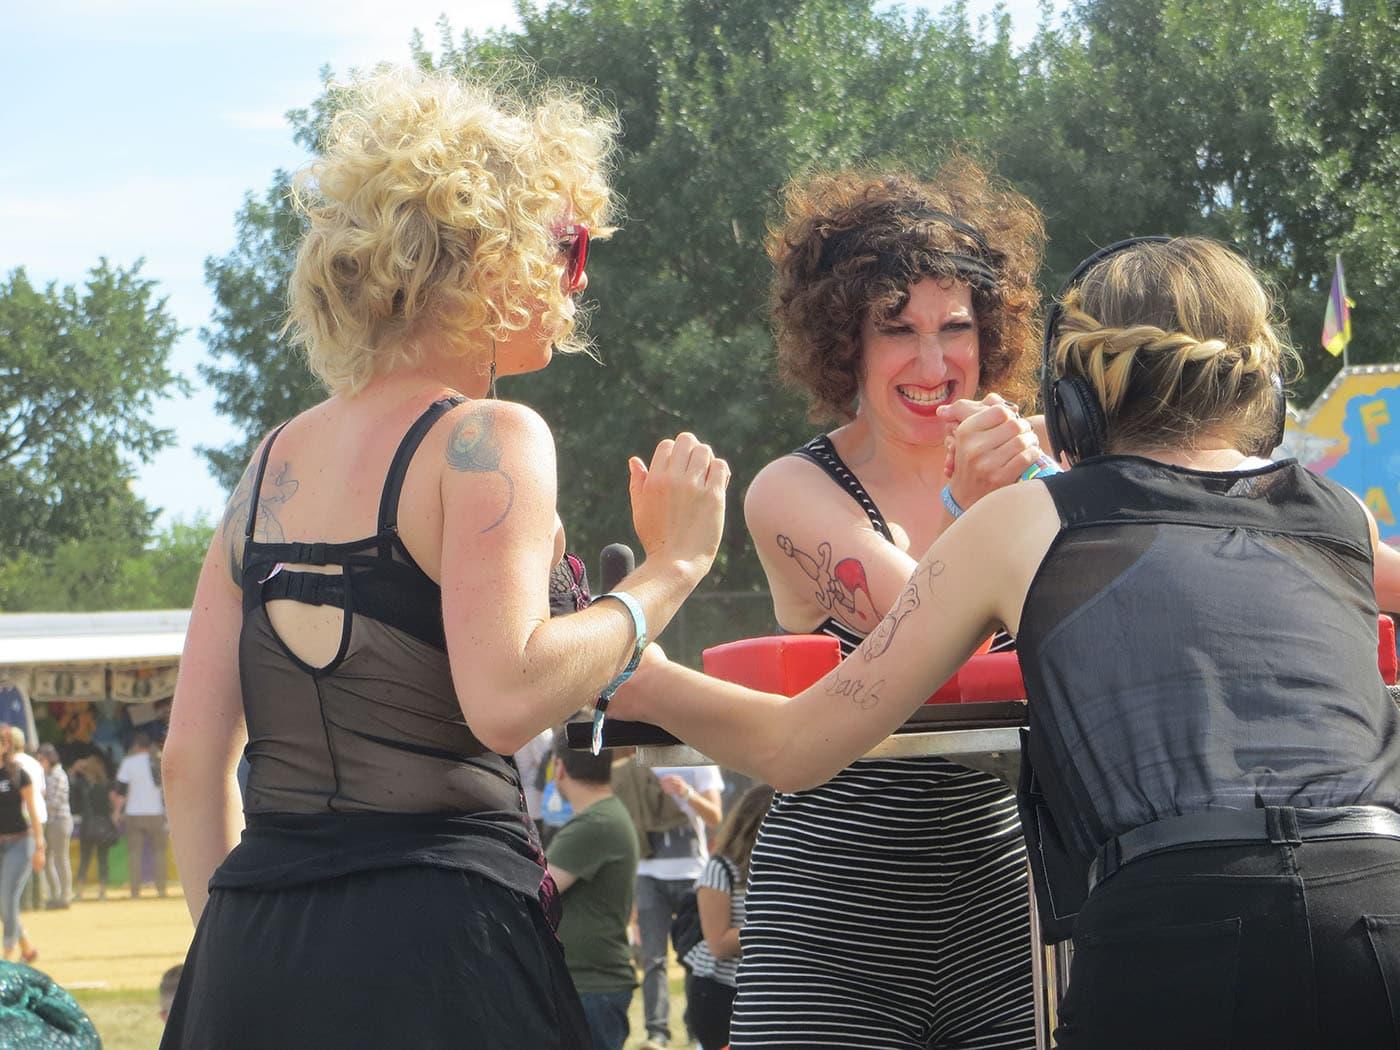 Lady arm wrestling at Riot Fest Chicago 2013